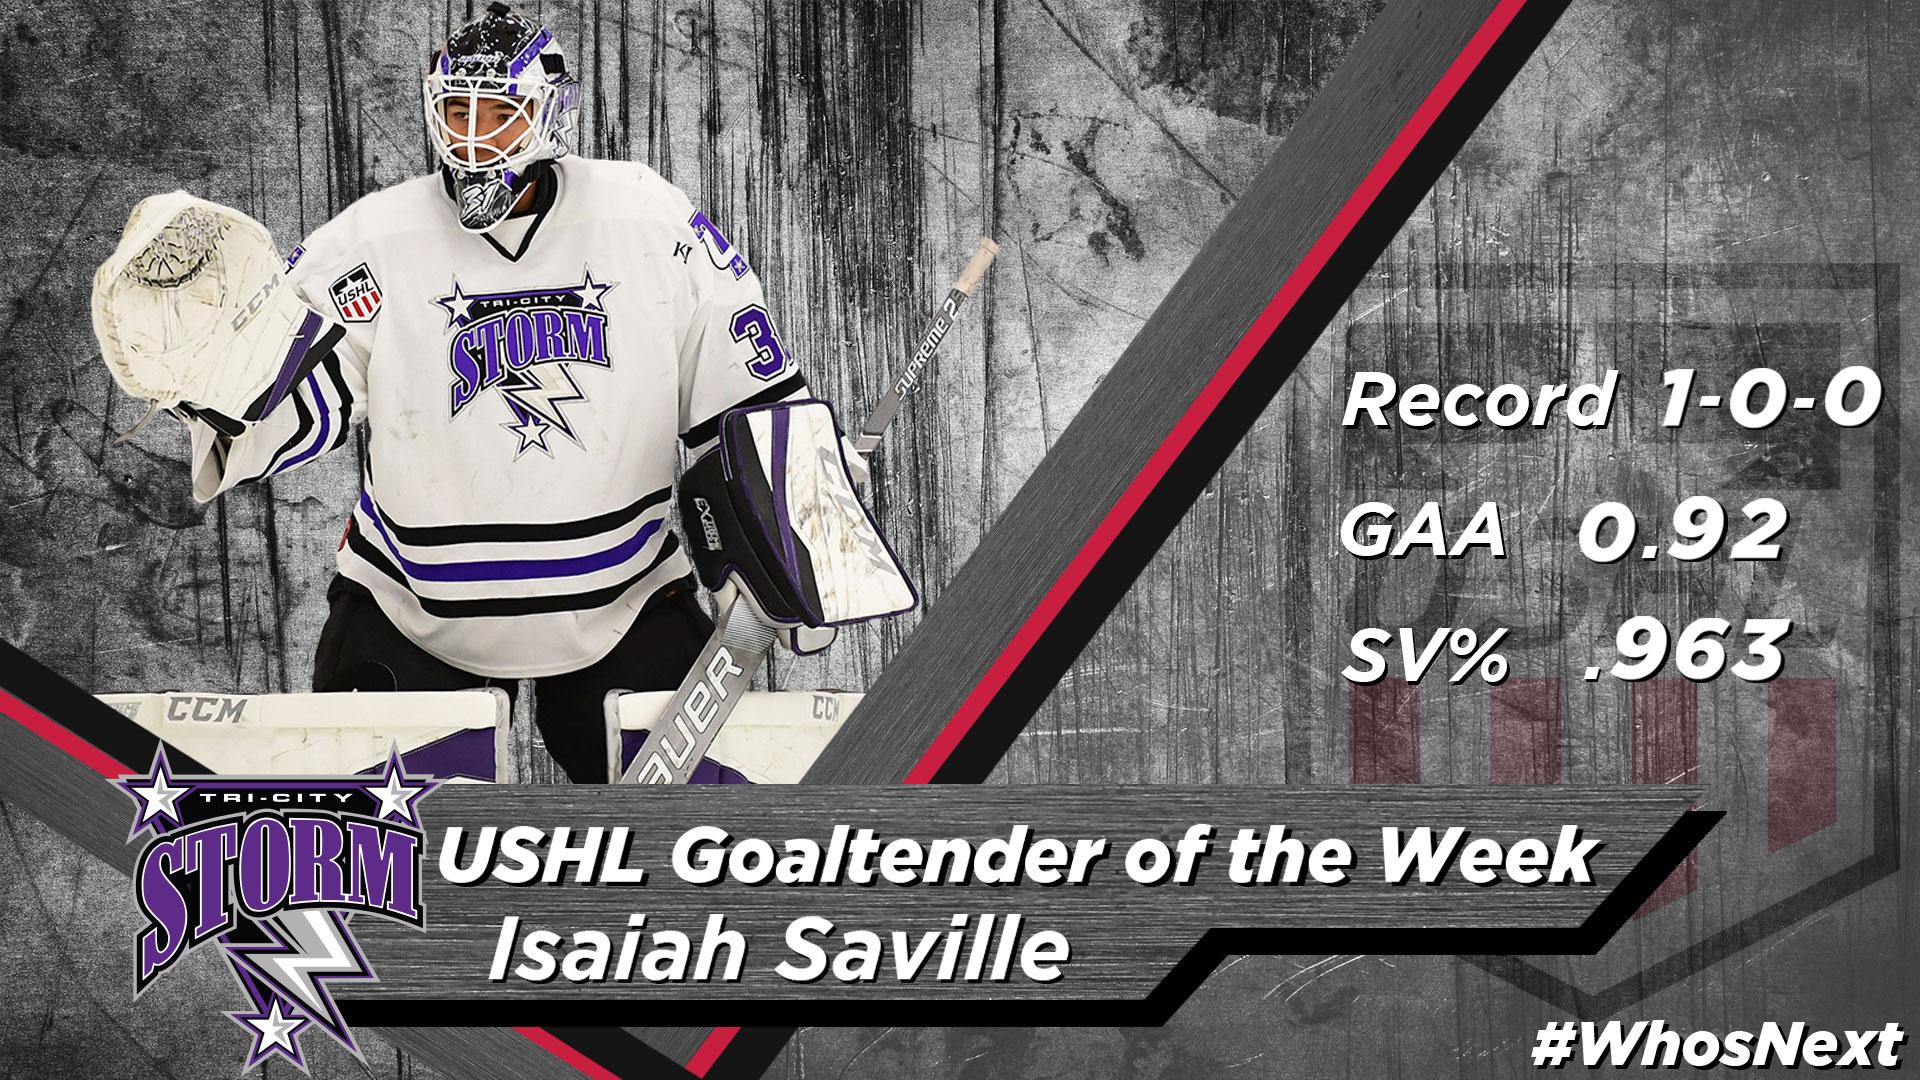 Goaltender: Isaiah Saville - Tri-City Storm